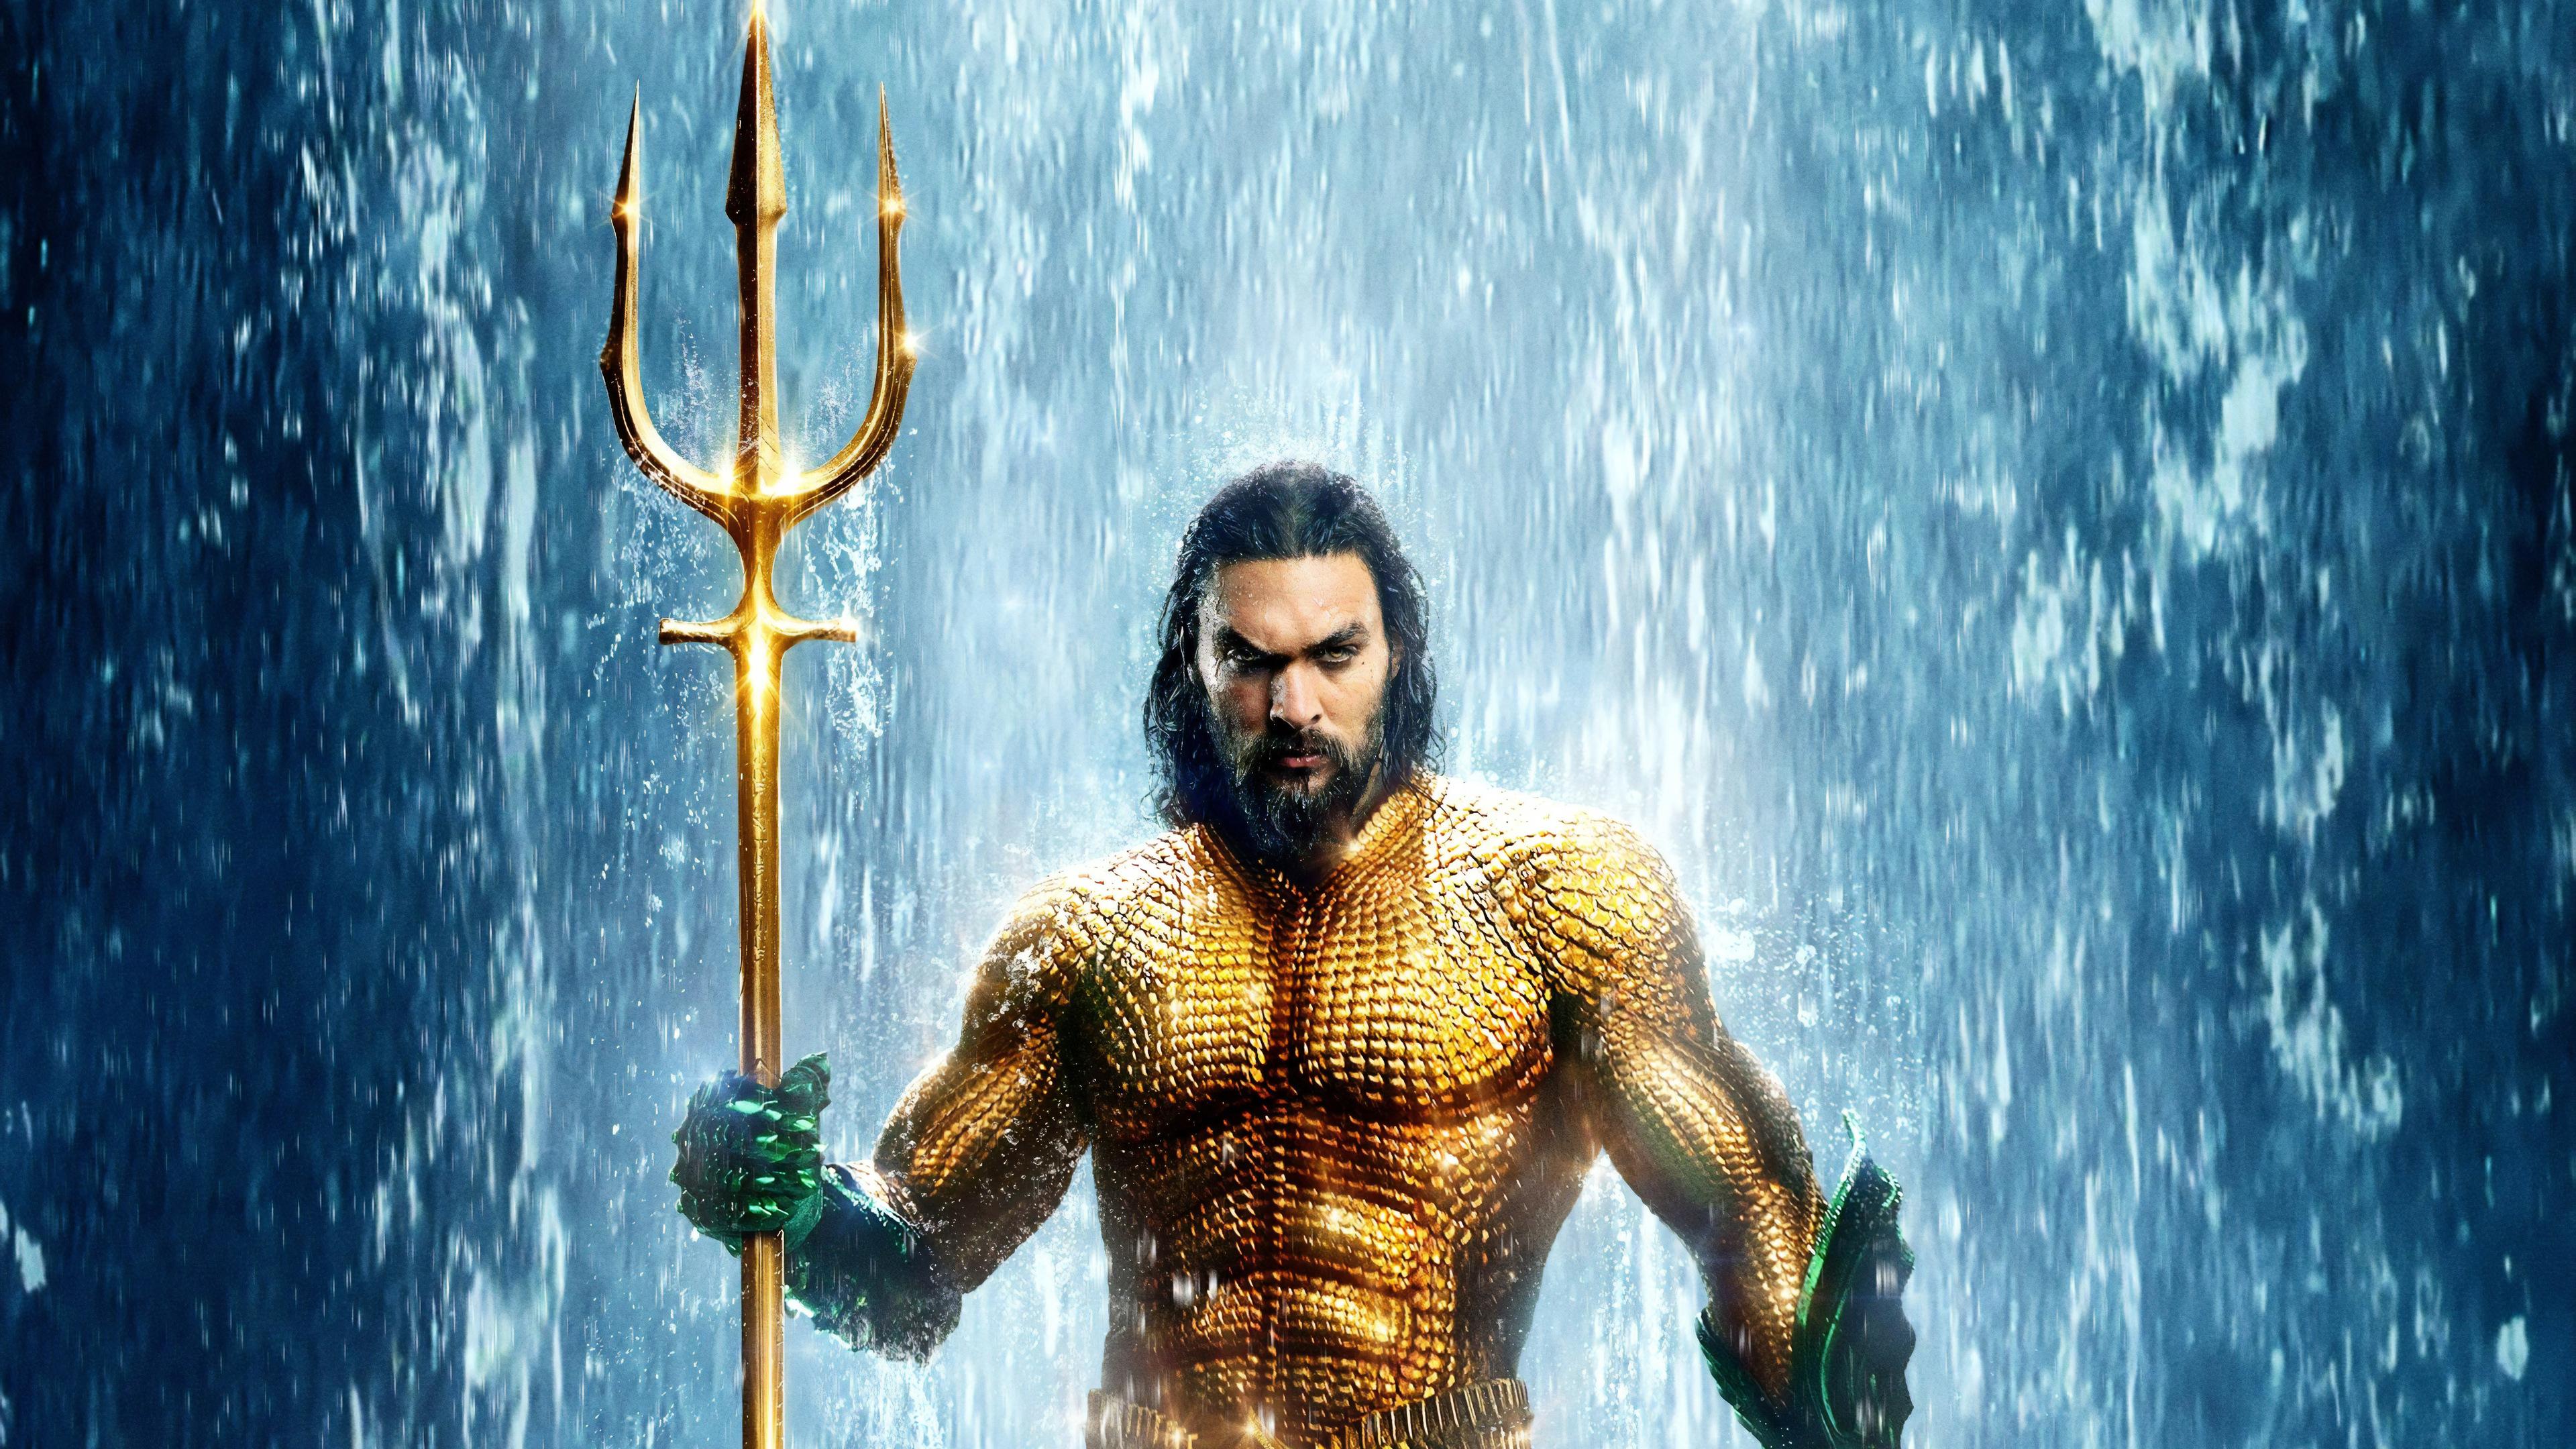 aquaman movie 10k j0 3840x2160 - Aquaman 4k 2018 movie - aquaman wallpapers hd 4k, Aquaman 4k 2018 movie wallpapers, Aquaman 2018 gold shield wallpapers